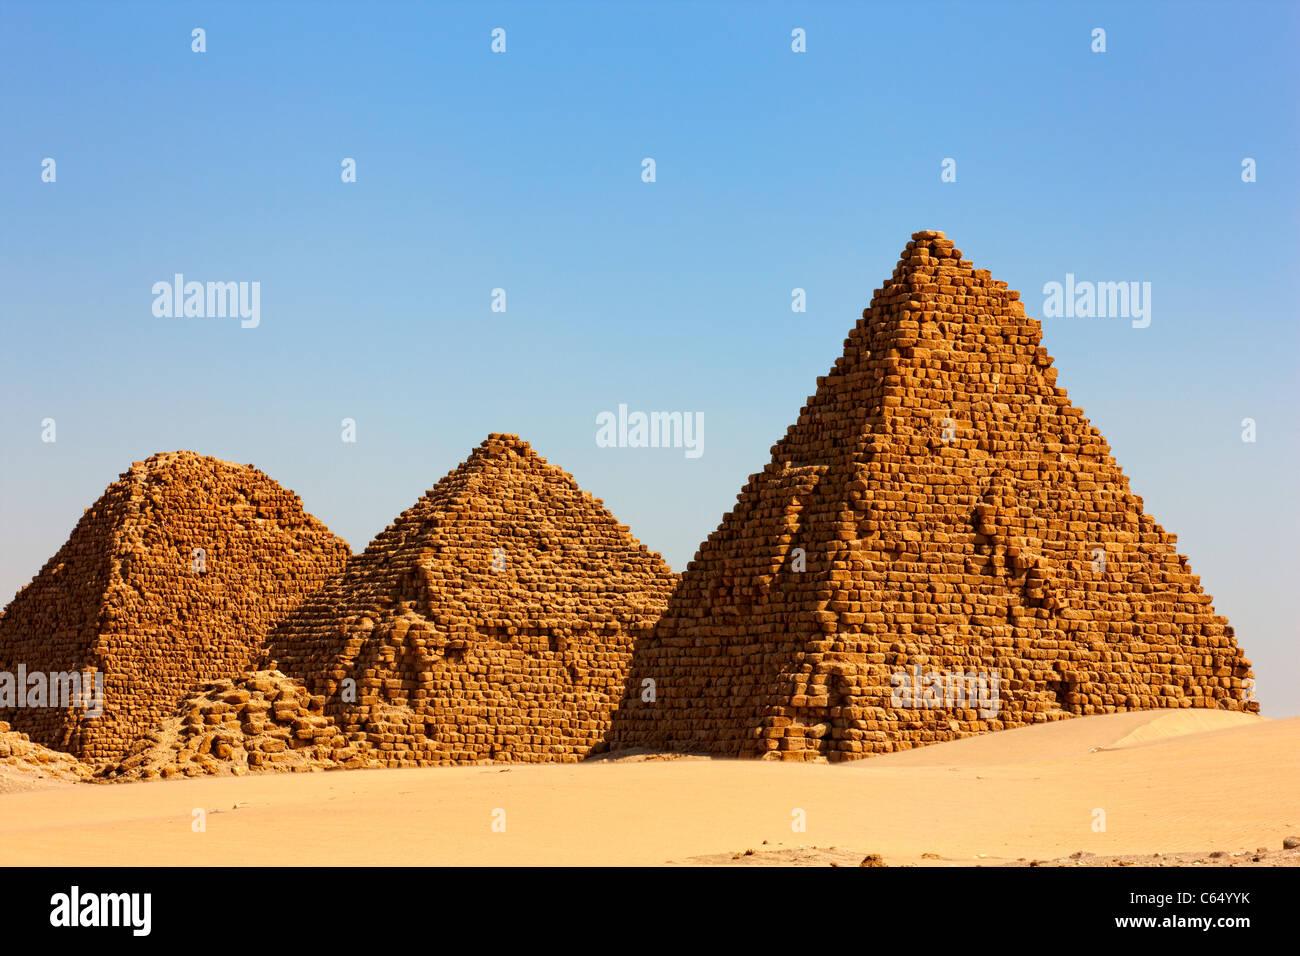 The Pyramids at Nuri, Northern Sudan, Africa Stock Photo